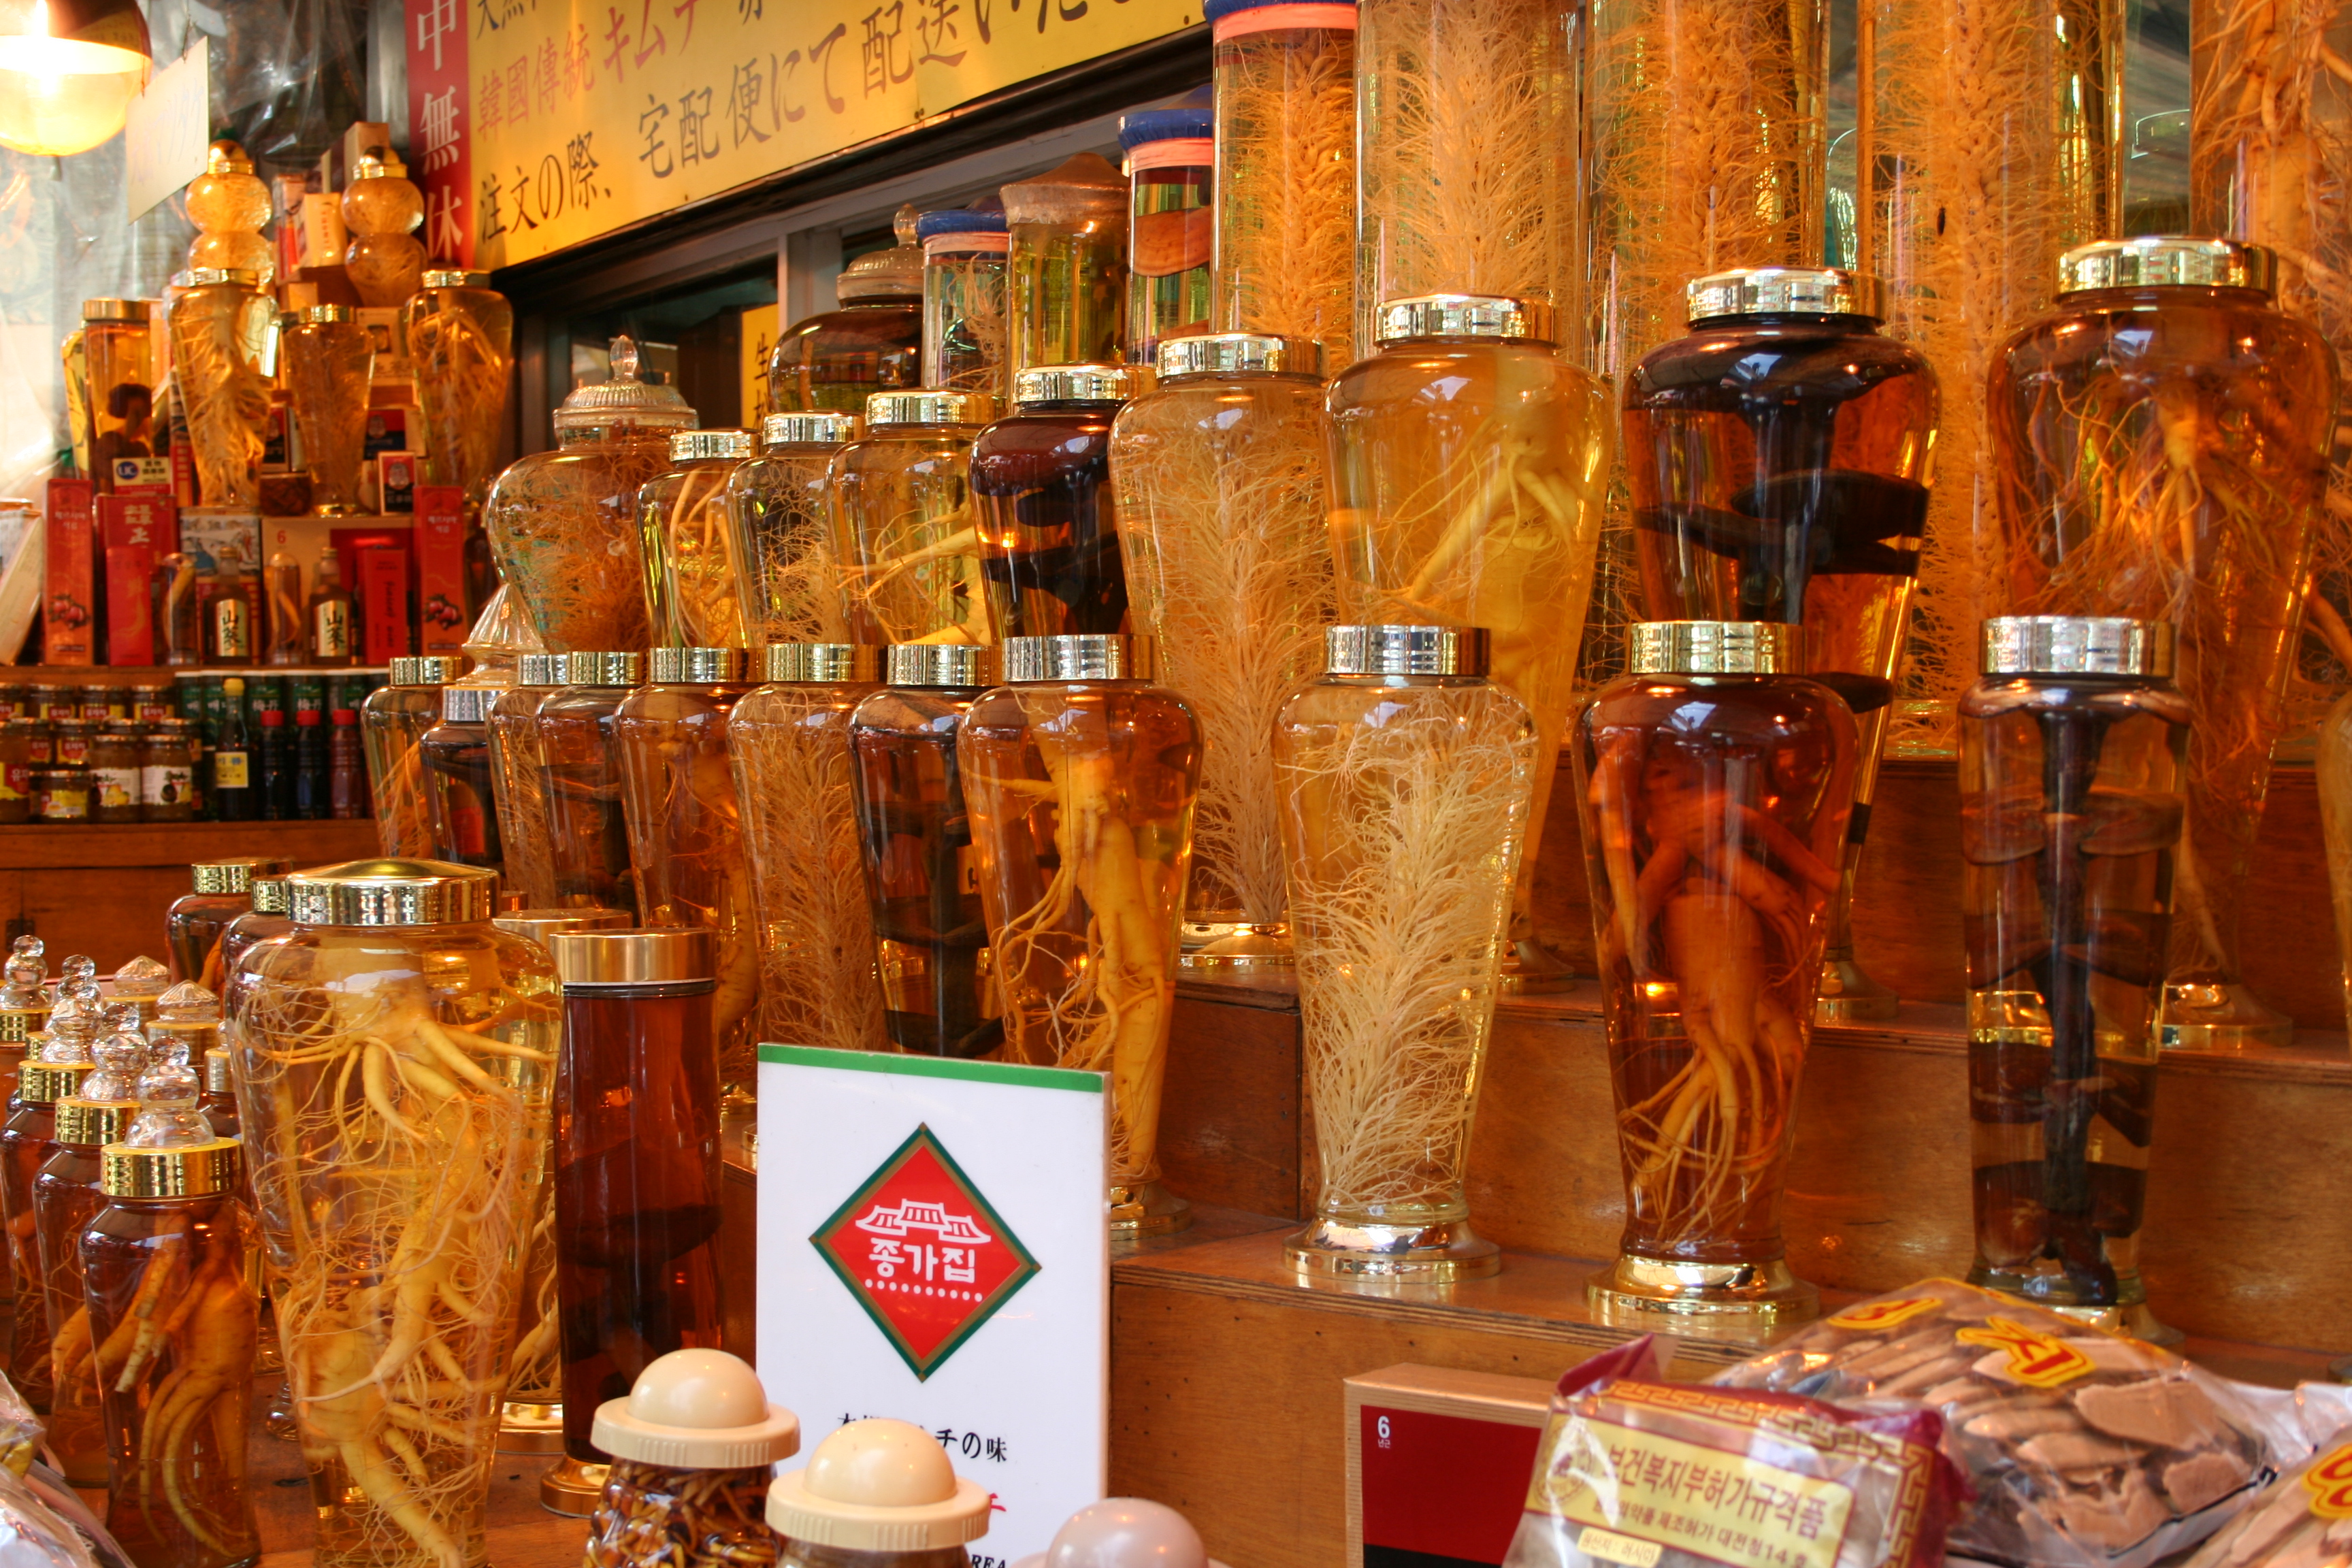 Radici di Ginseng al mercato di Seoul (fonte: Wikipedia.org)